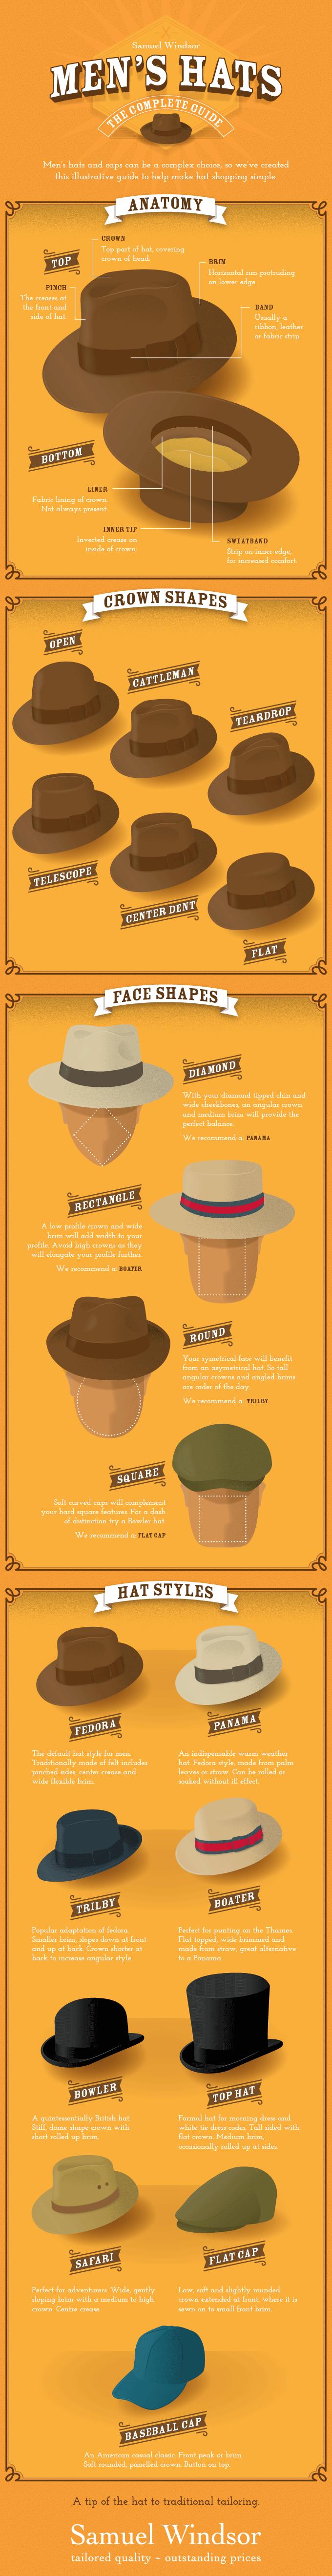 1b6923dcd38 Men s Dress Codes Made Simple — Cool Infographics